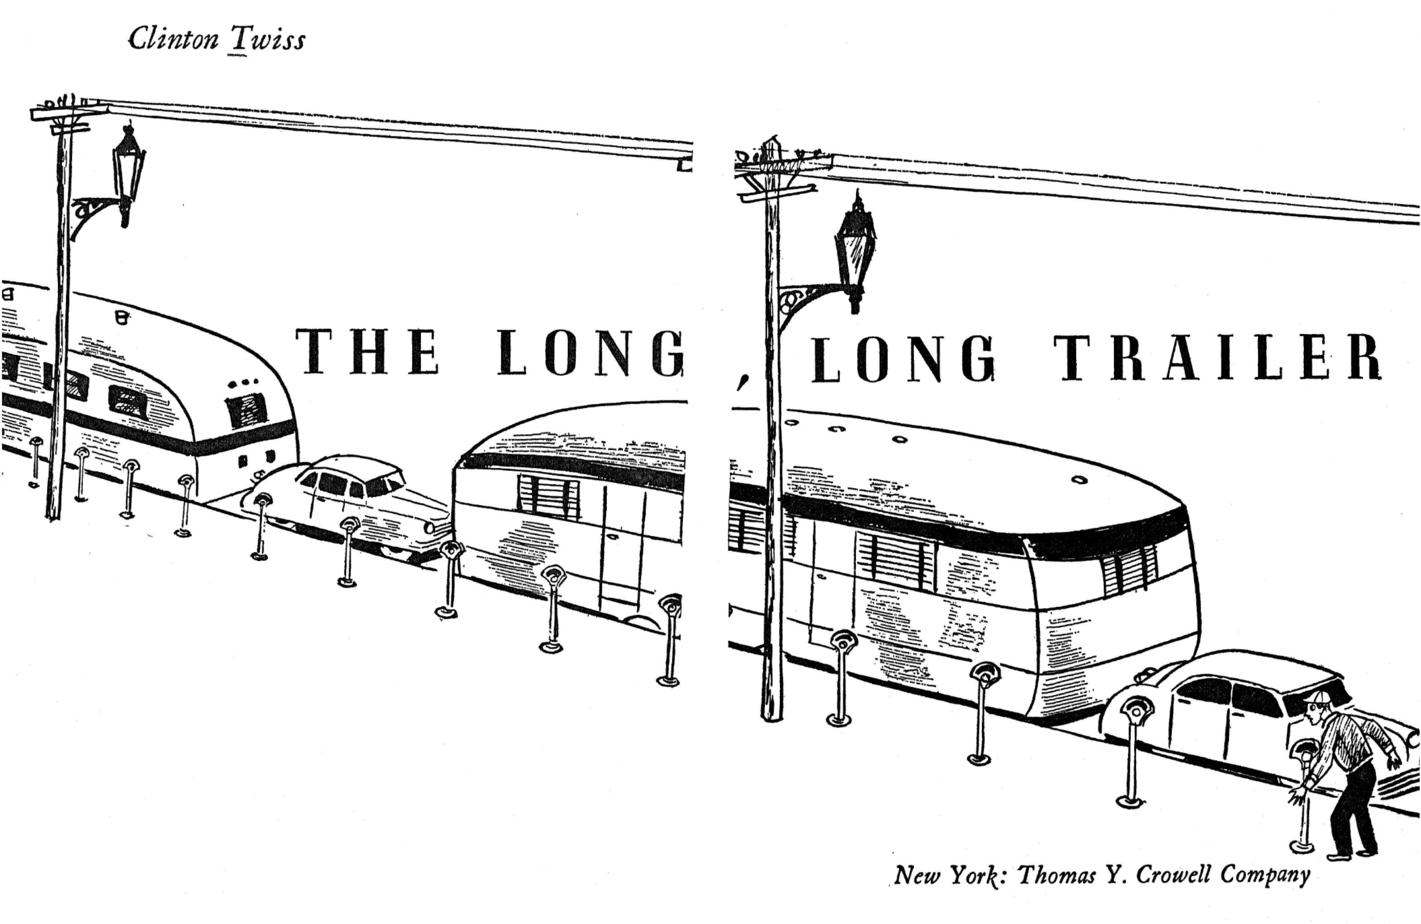 The long long trailer book illustration